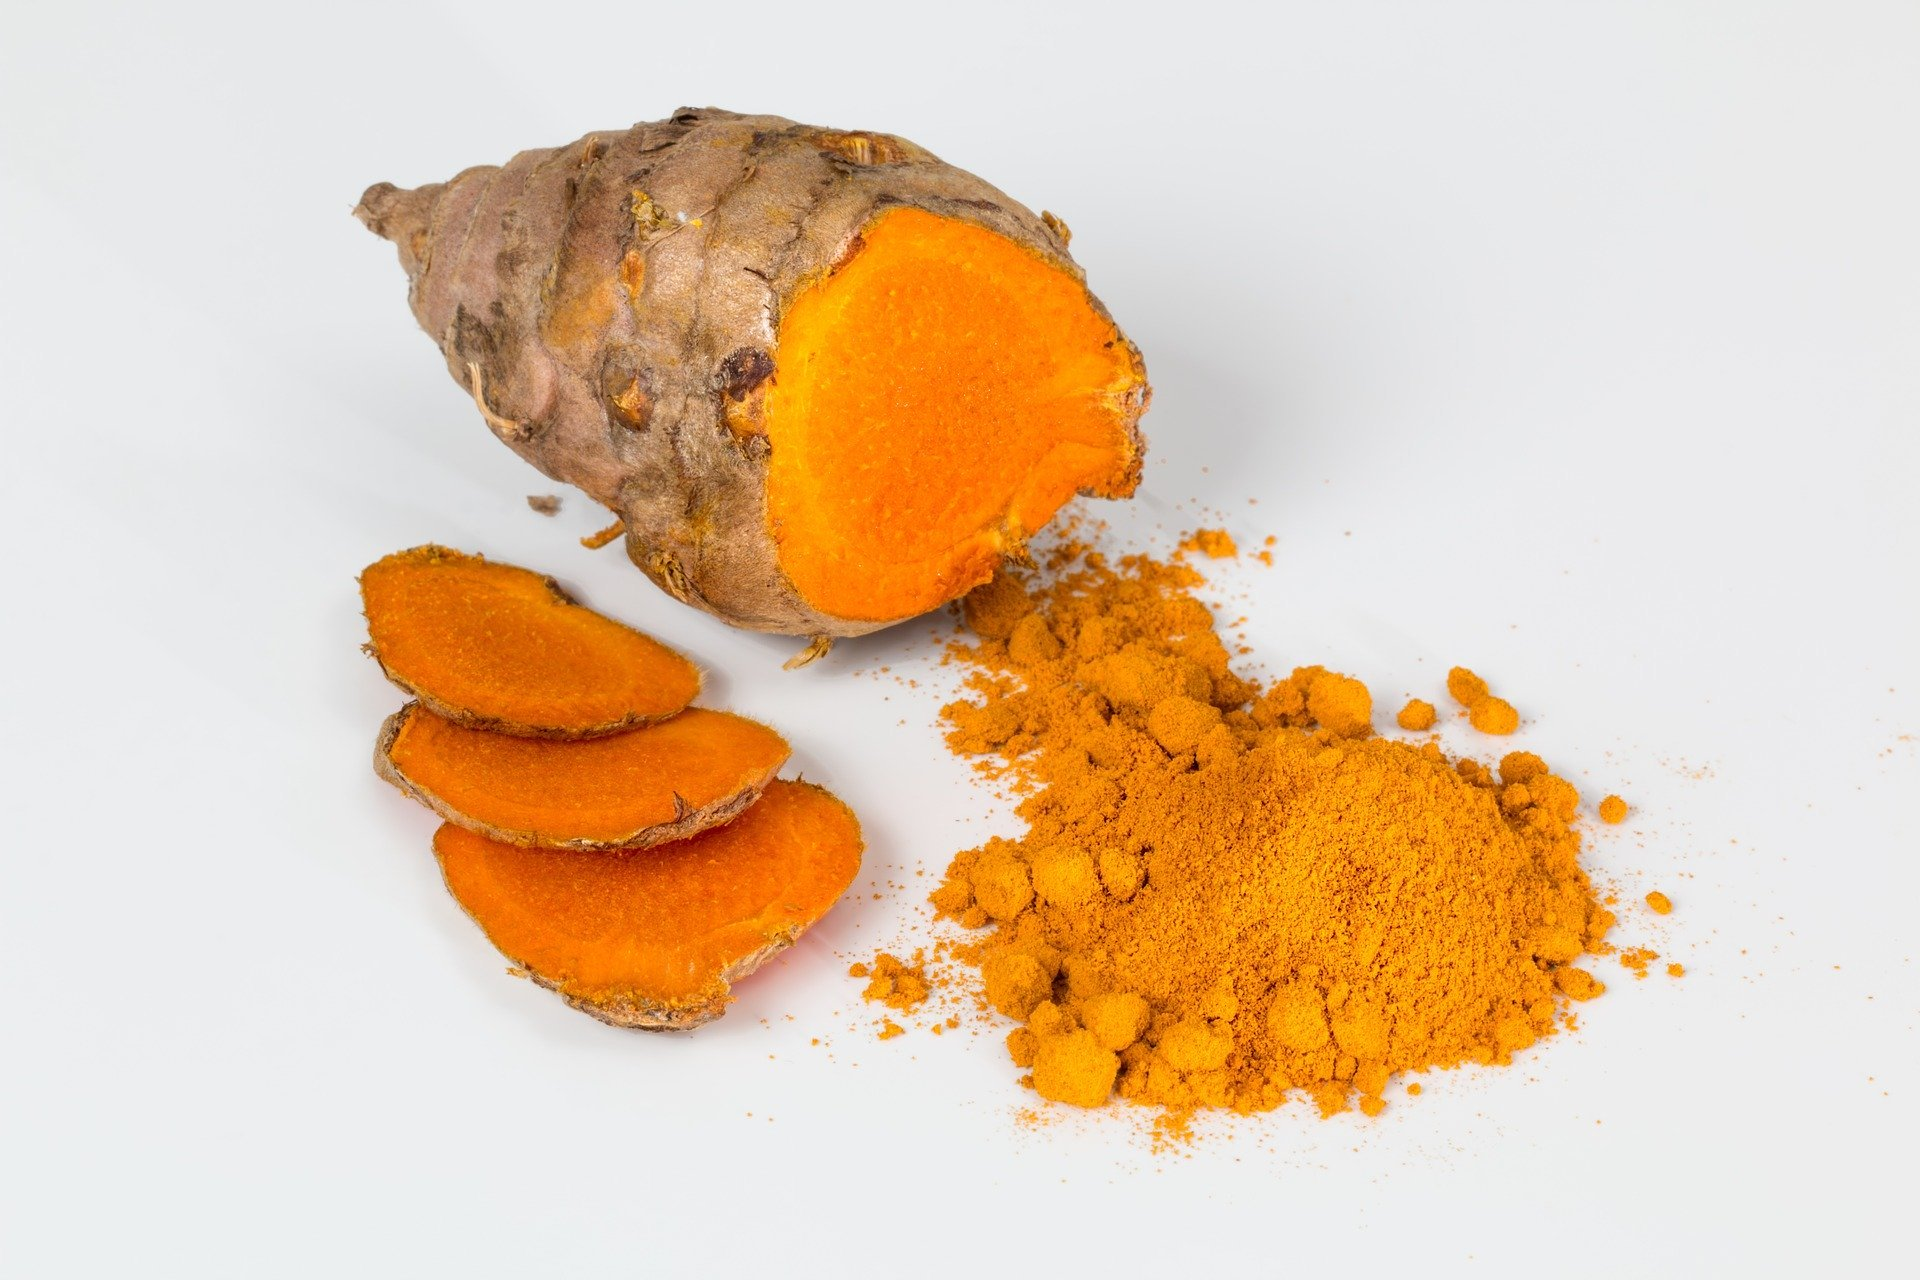 increase glutathione naturally by using turmeric. turmeric. wild turmeric. www.blisslife.in